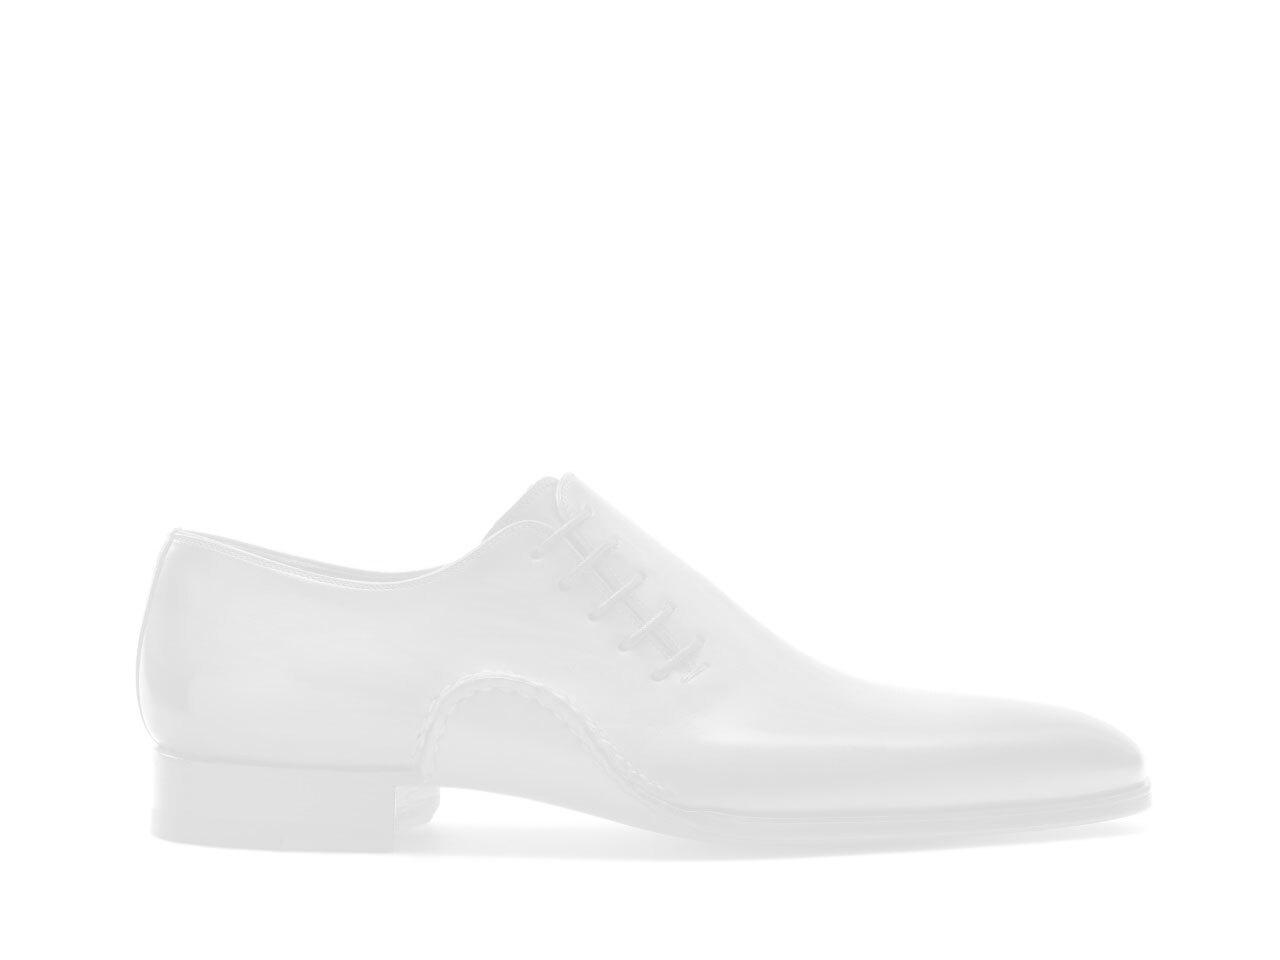 Pair of the Magnanni Nesto Navy Men's Sneakers